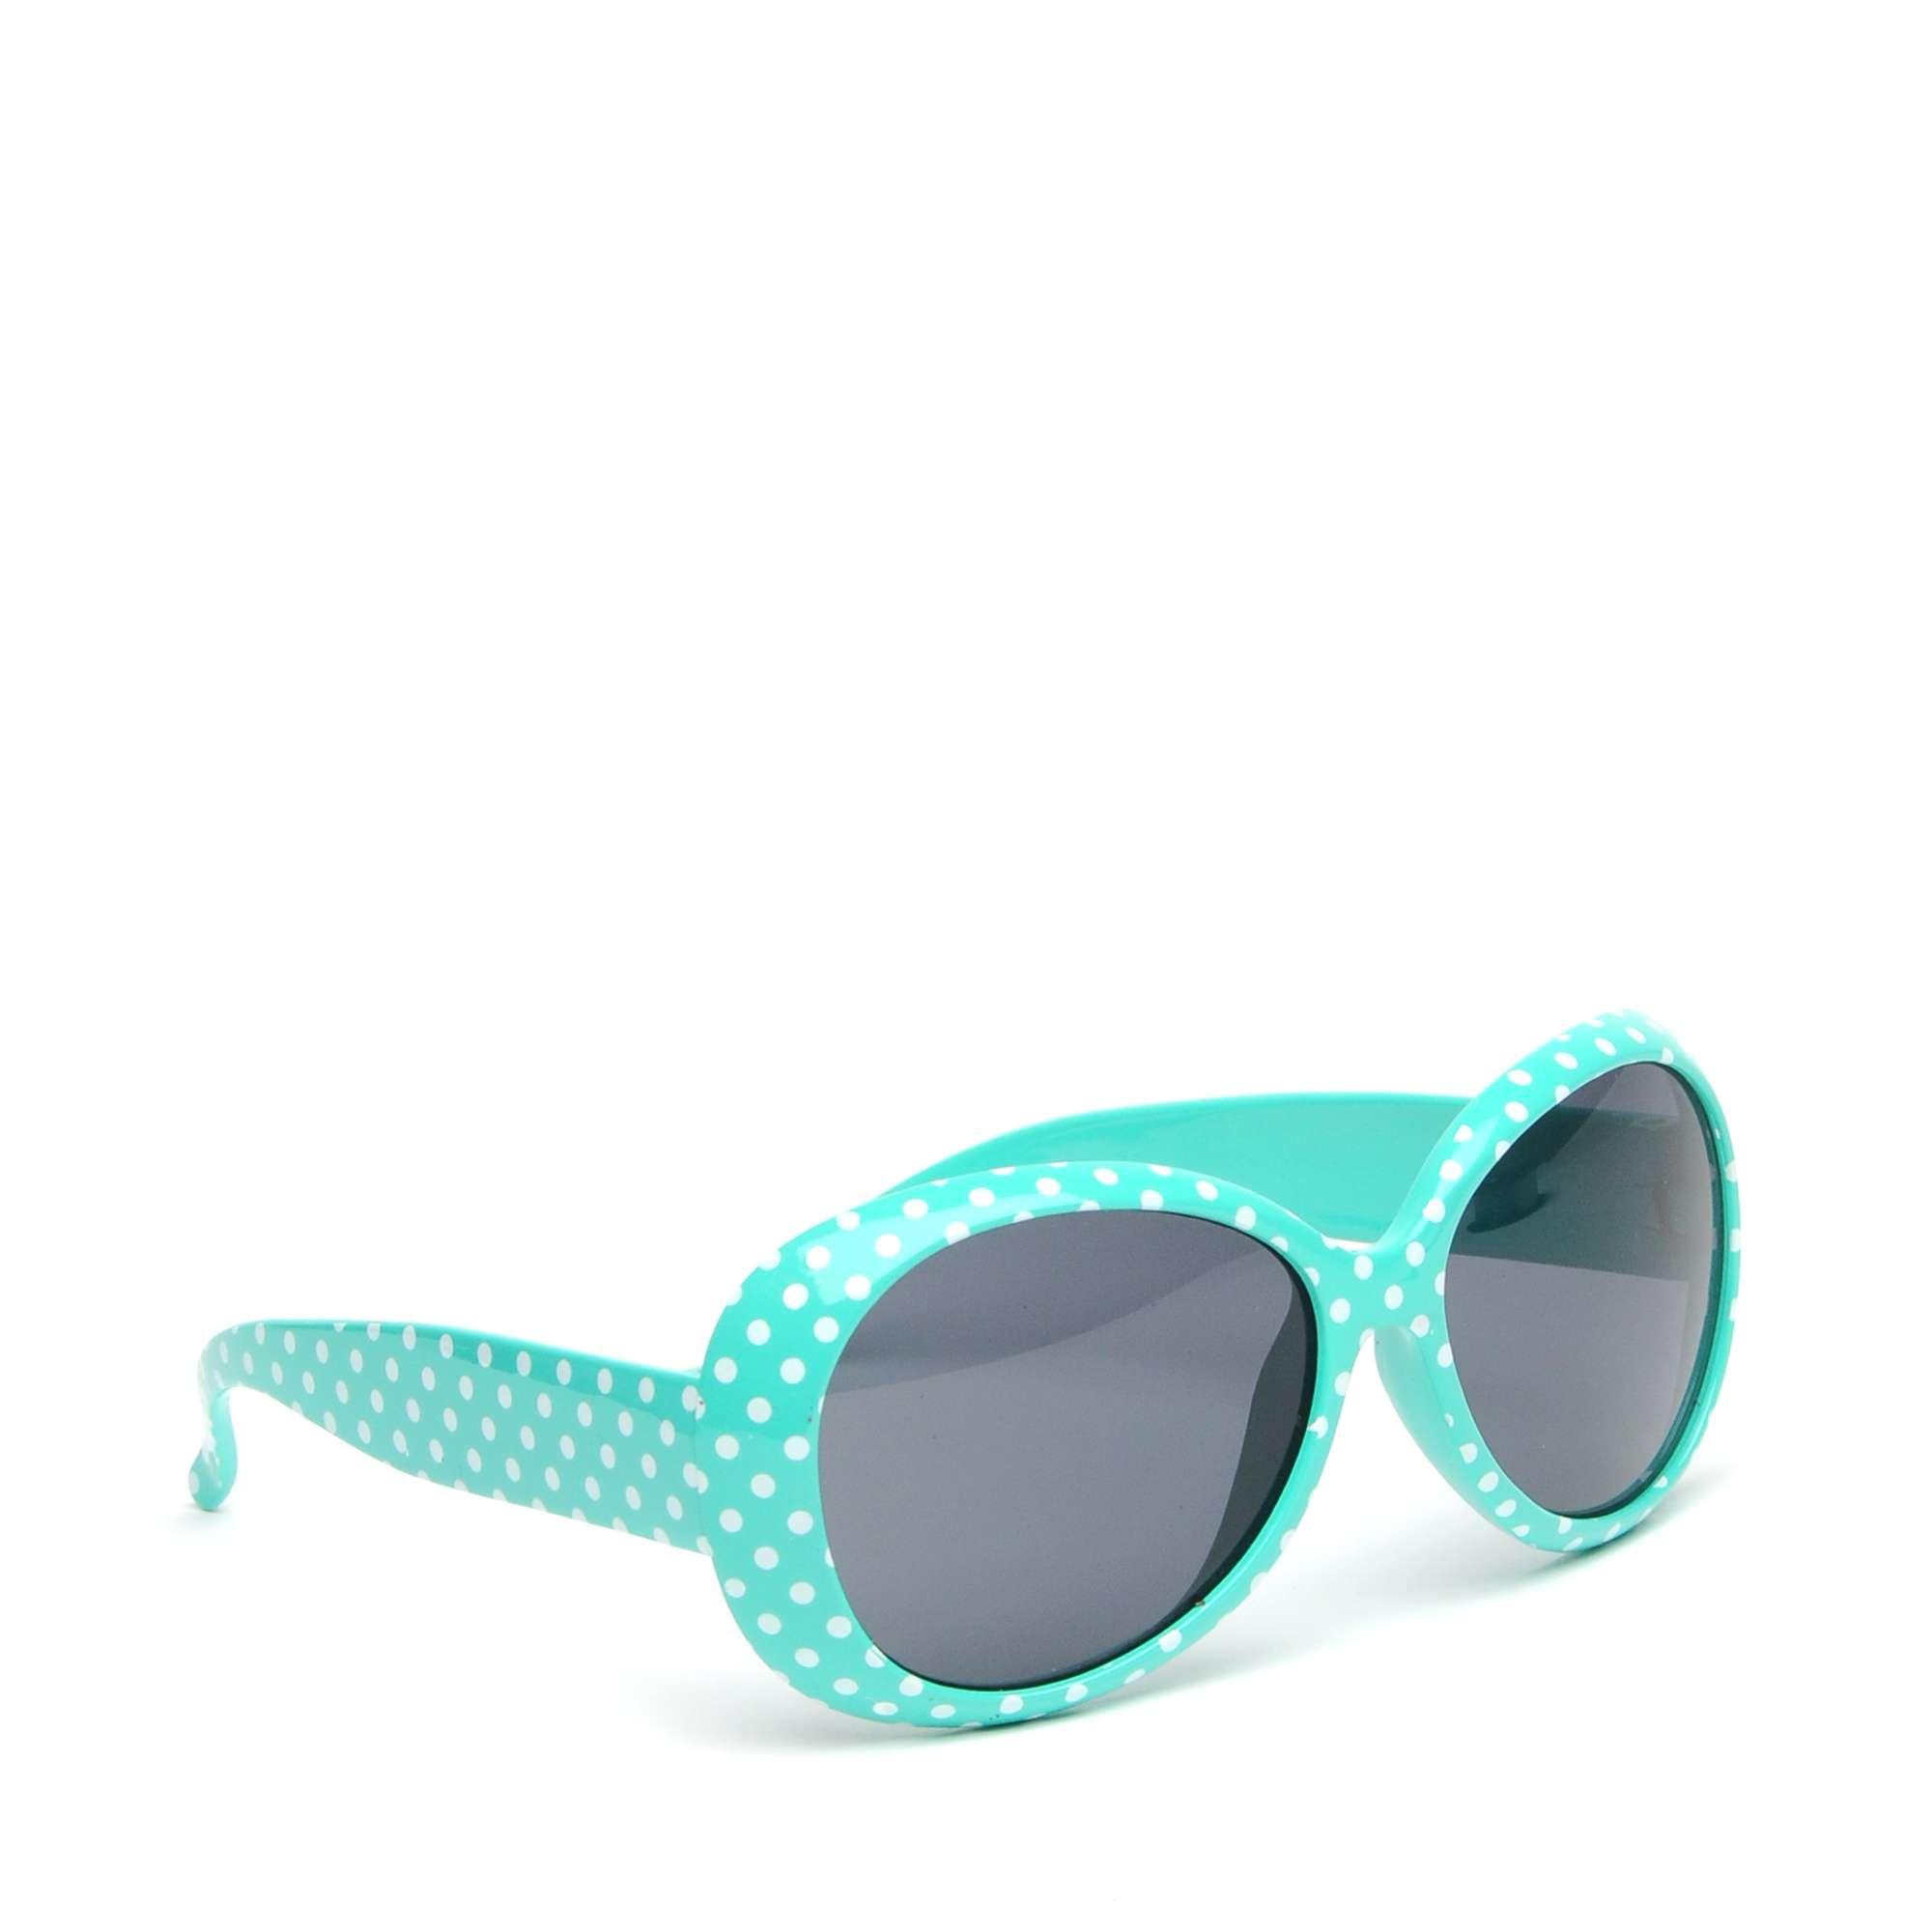 PETER STORM Girls' FF Retro Sunglasses